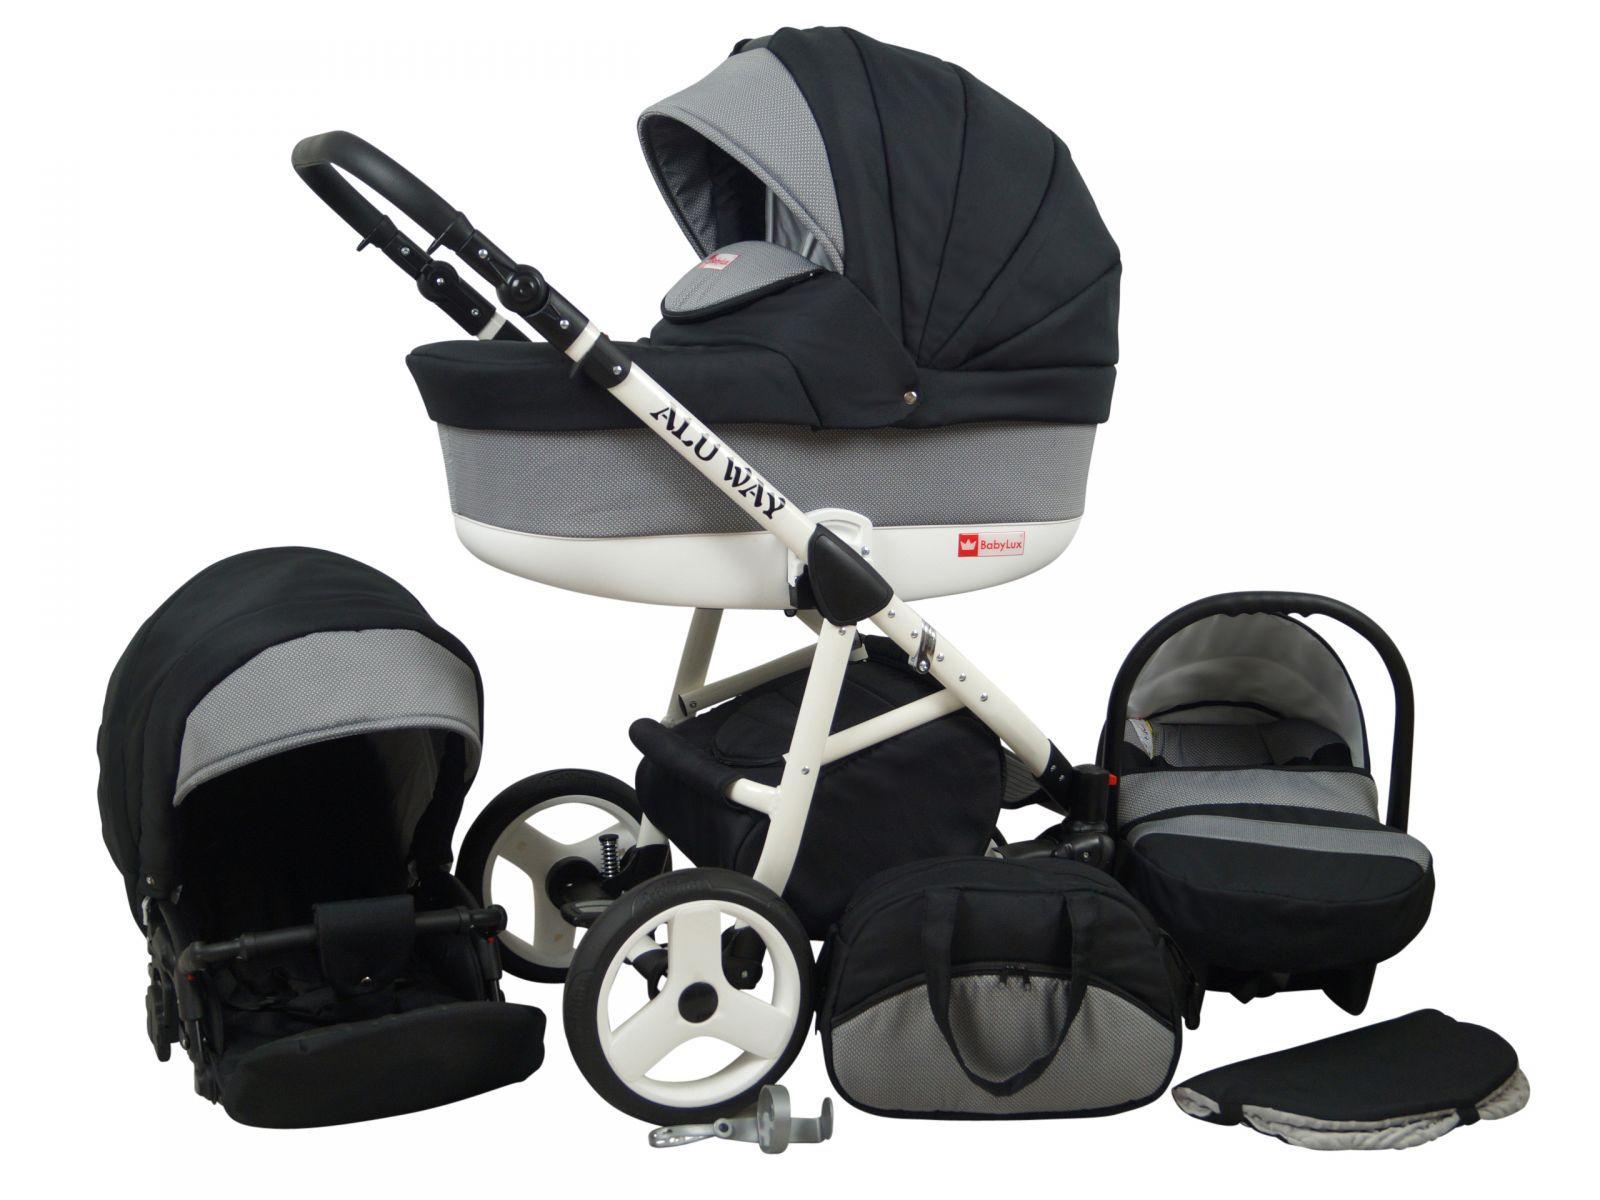 Raf pol Baby Lux Alu way 2v1 2020 Carbon + u nás ZÁRUKA 3 ROKY Raf-pol